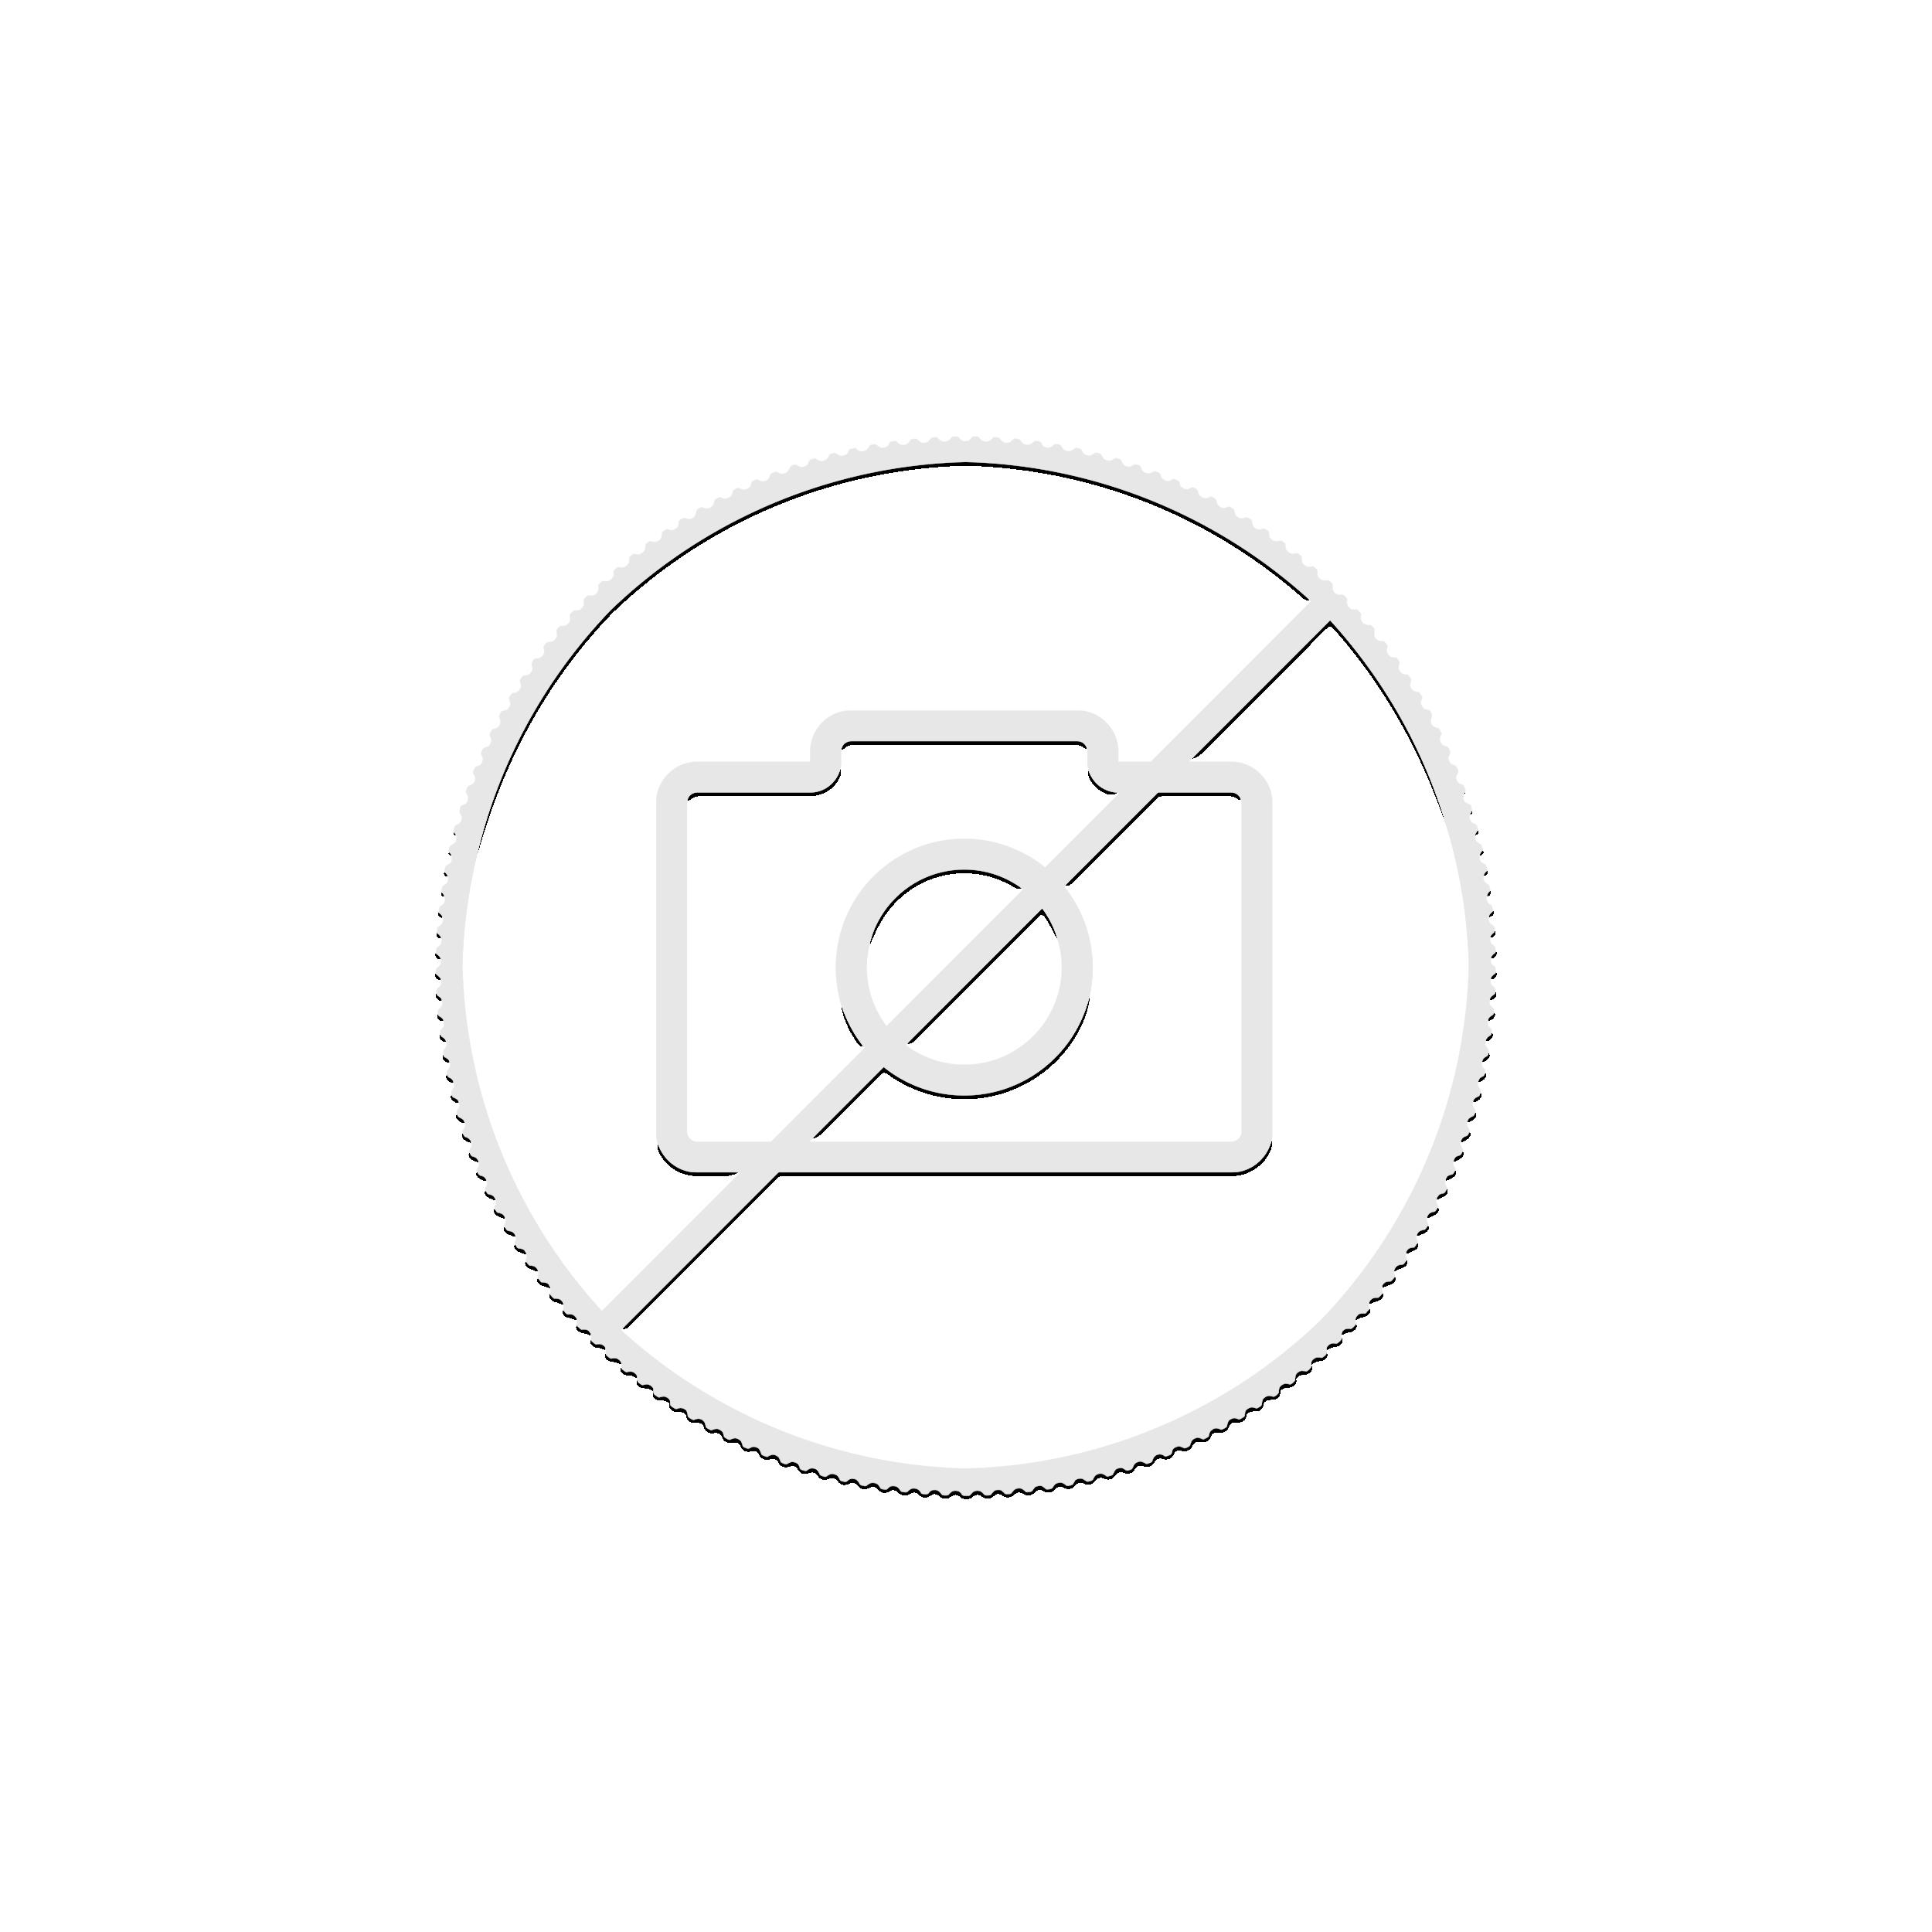 3 Gram gouden Panda munt 2018